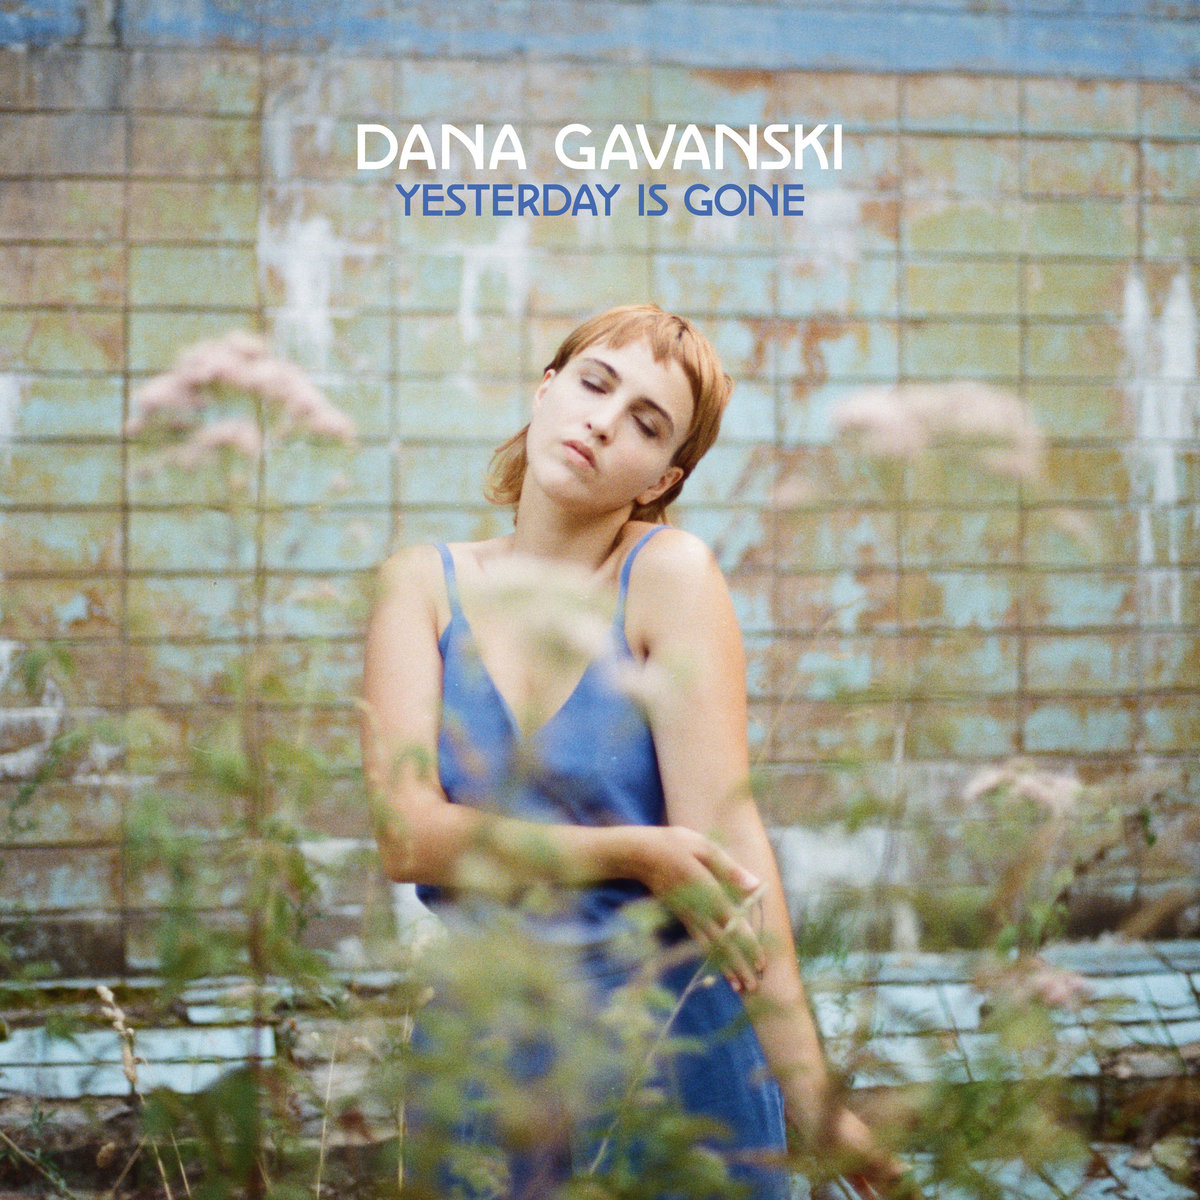 Track by Track: Dana Gavanski on debut album Yesterday is Gone